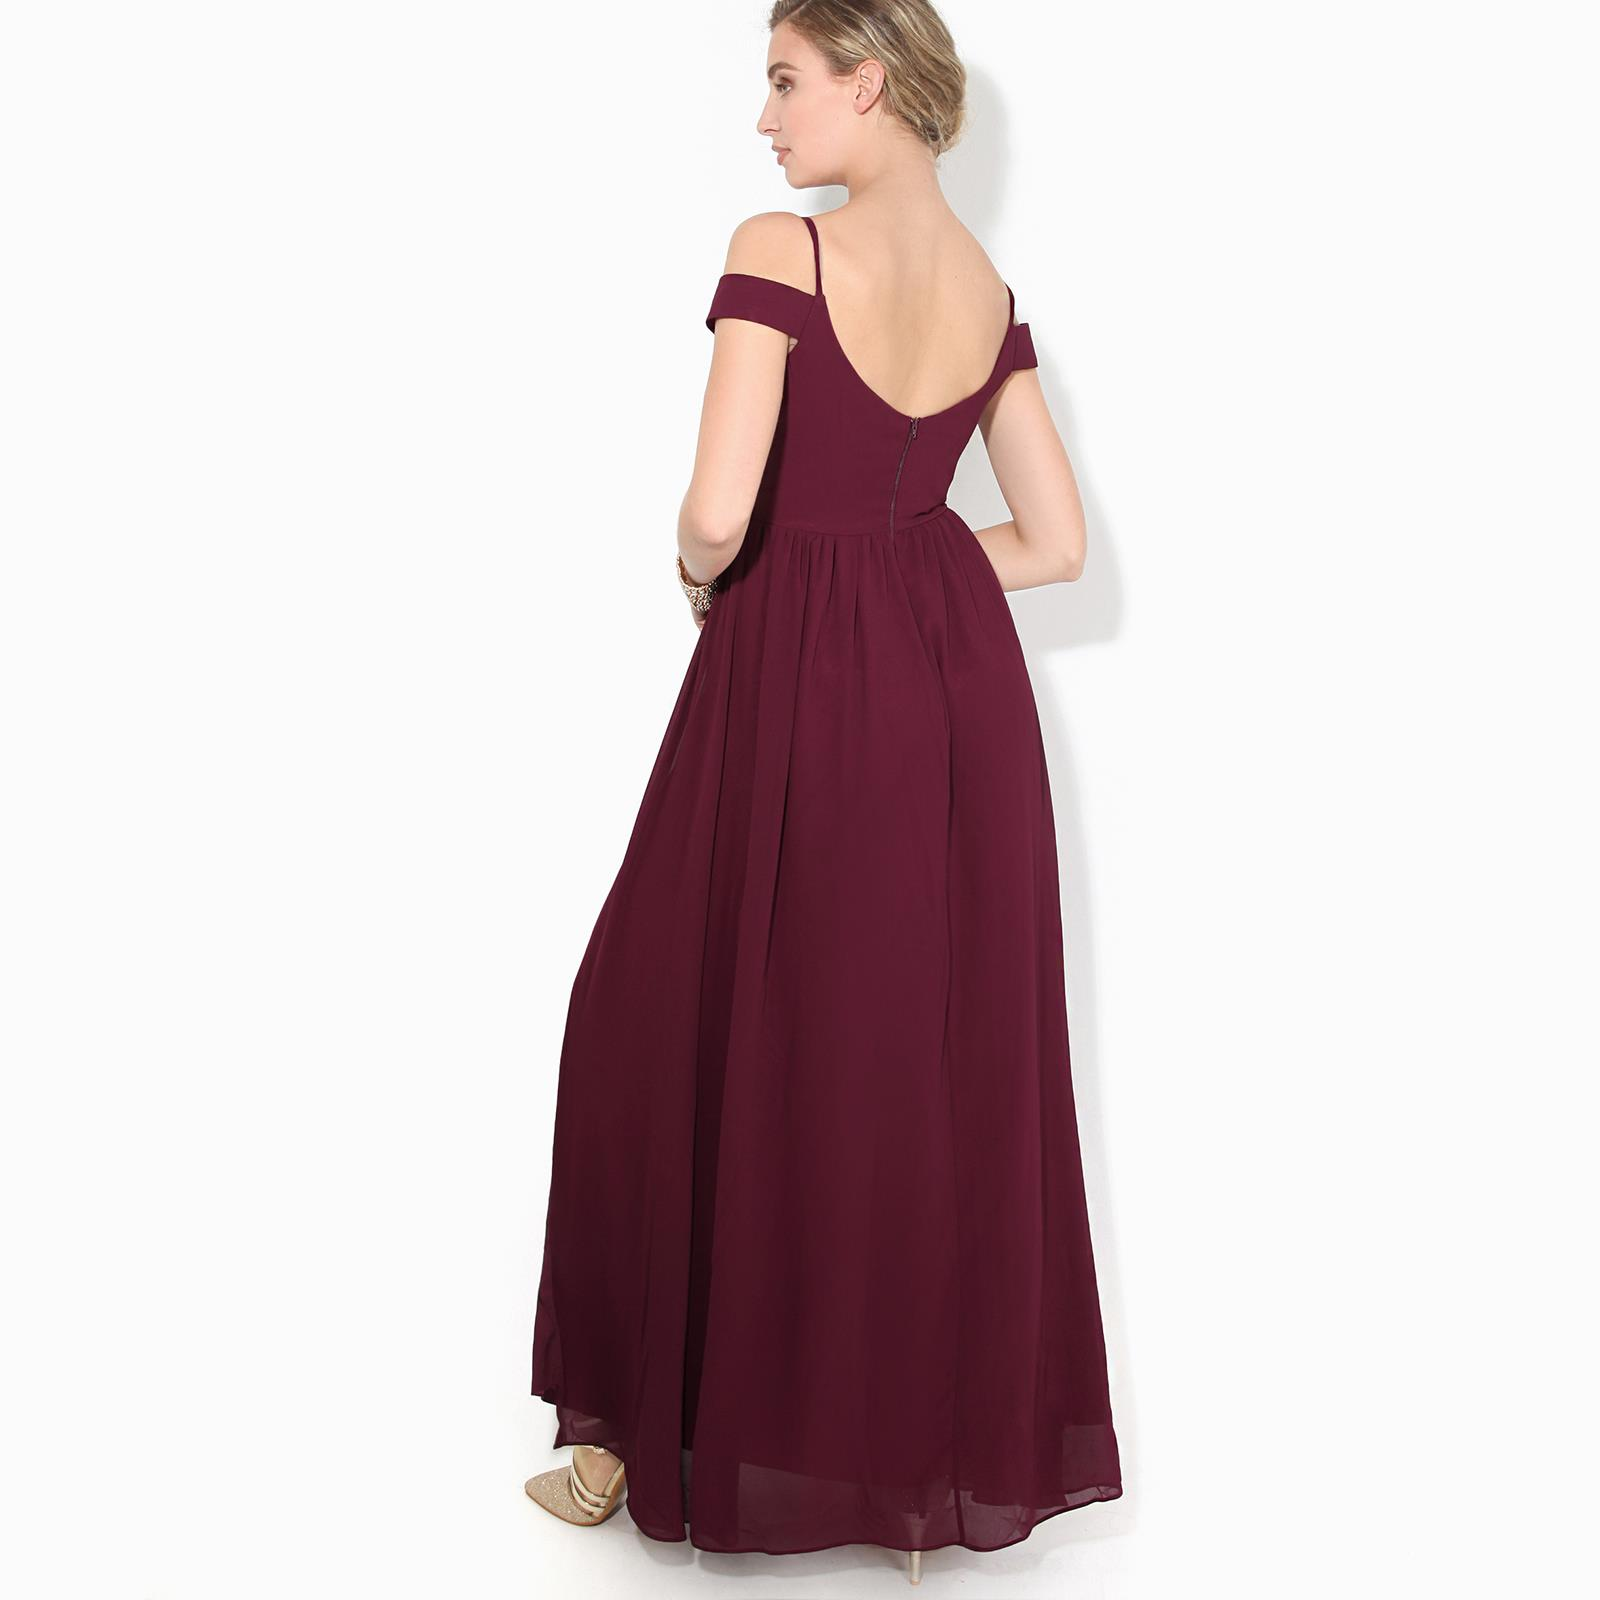 Womens-Ladies-Off-Shoulder-Formal-Maxi-Dress-Slit-Split-Long-Gown-Wedding-Party thumbnail 16